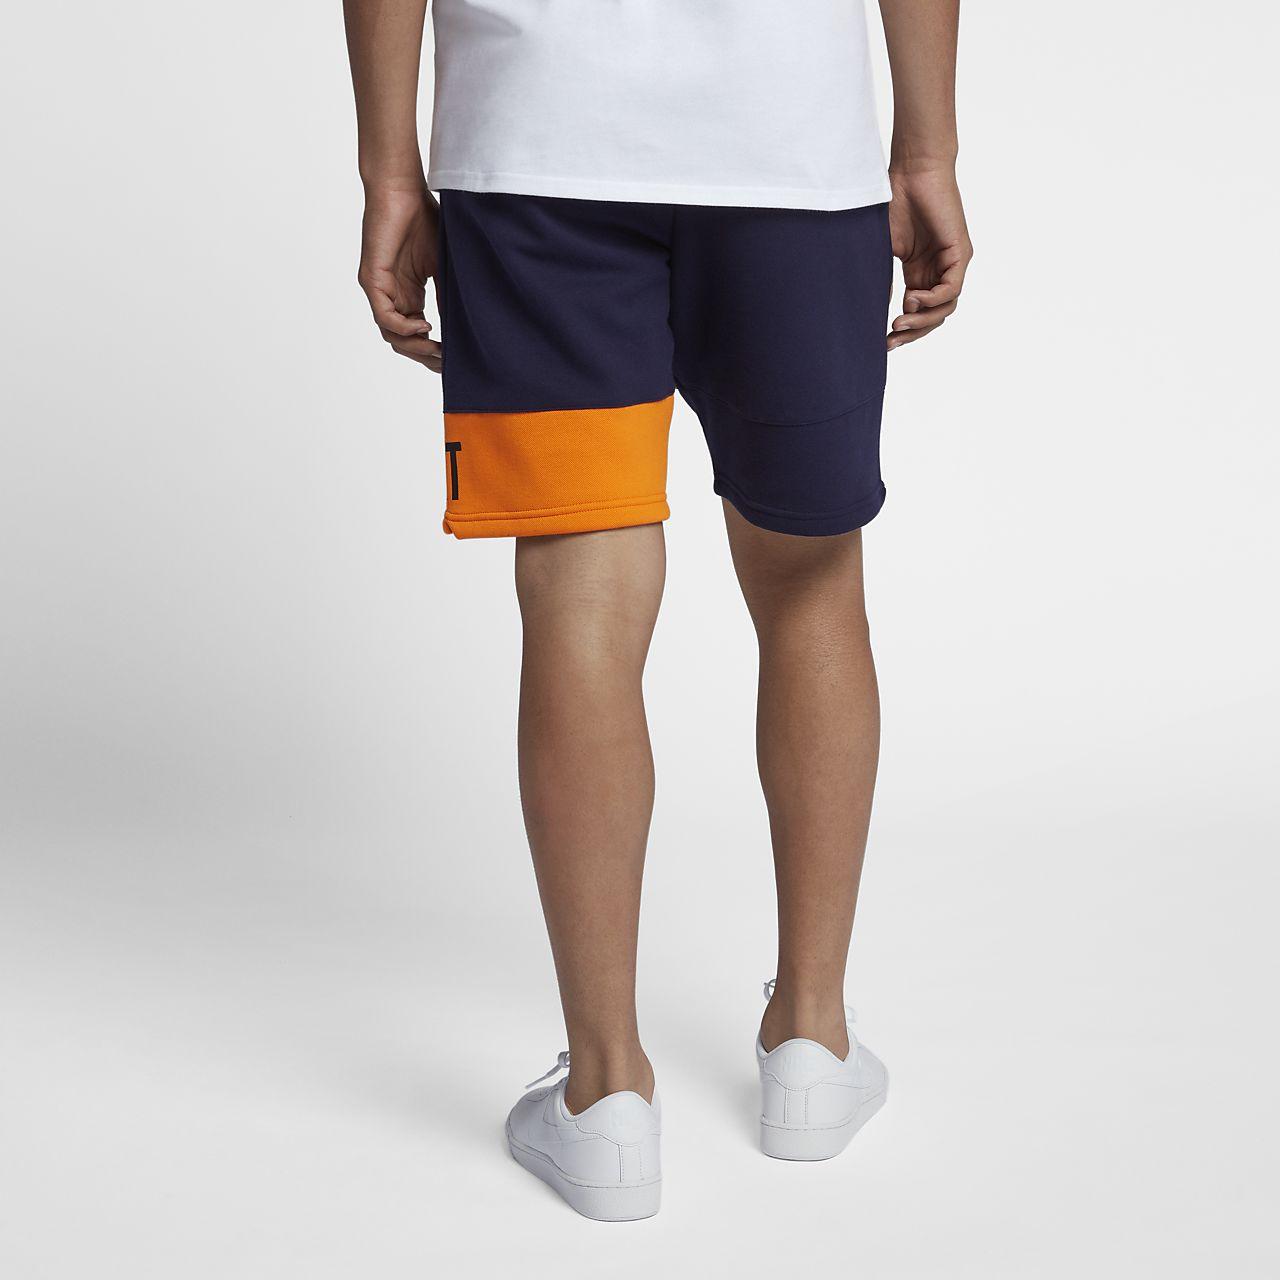 a17834310a5d9 NikeCourt Men s Tennis Shorts. Nike.com ZA